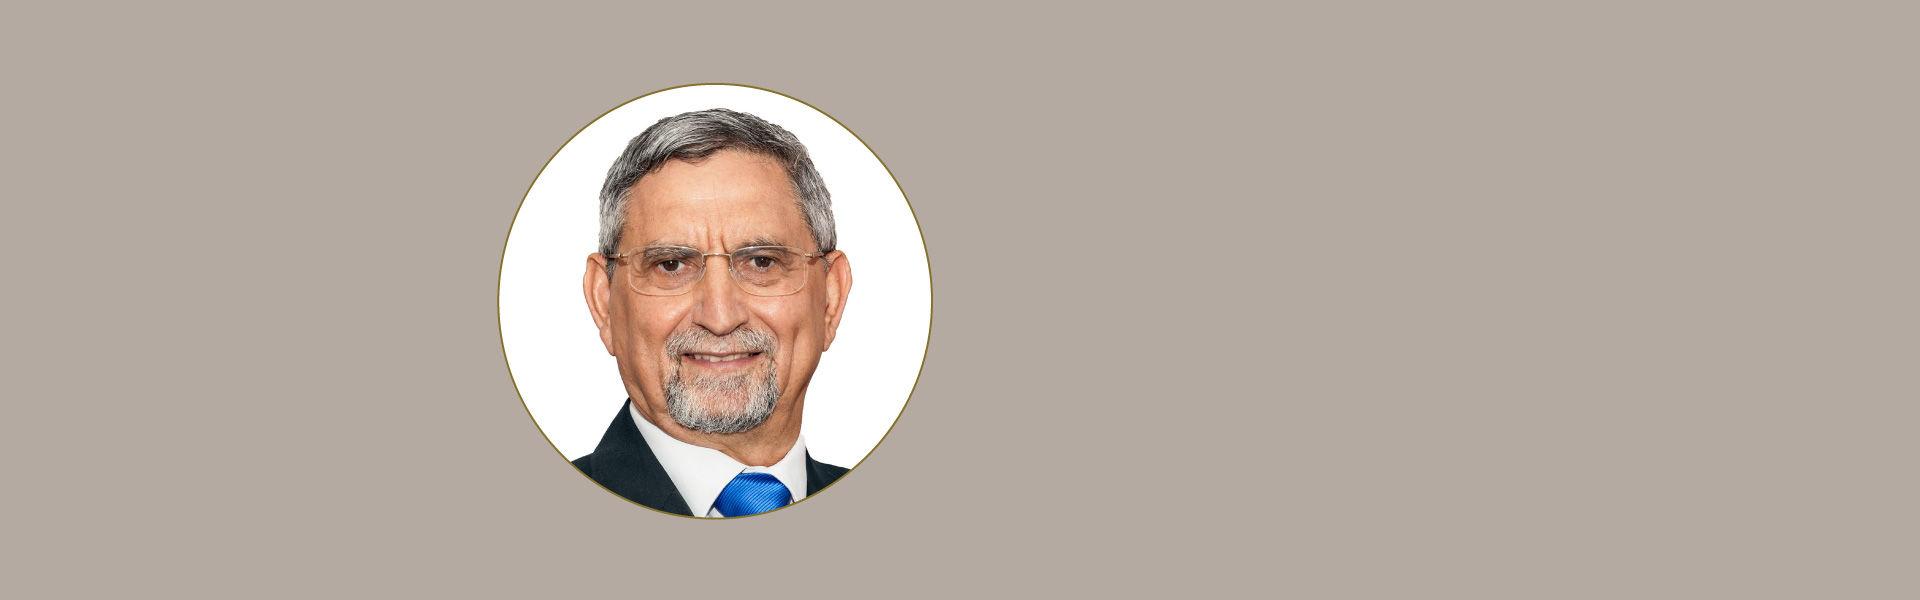 ULisboa concede título de Honoris Causa a Jorge Carlos Fonseca